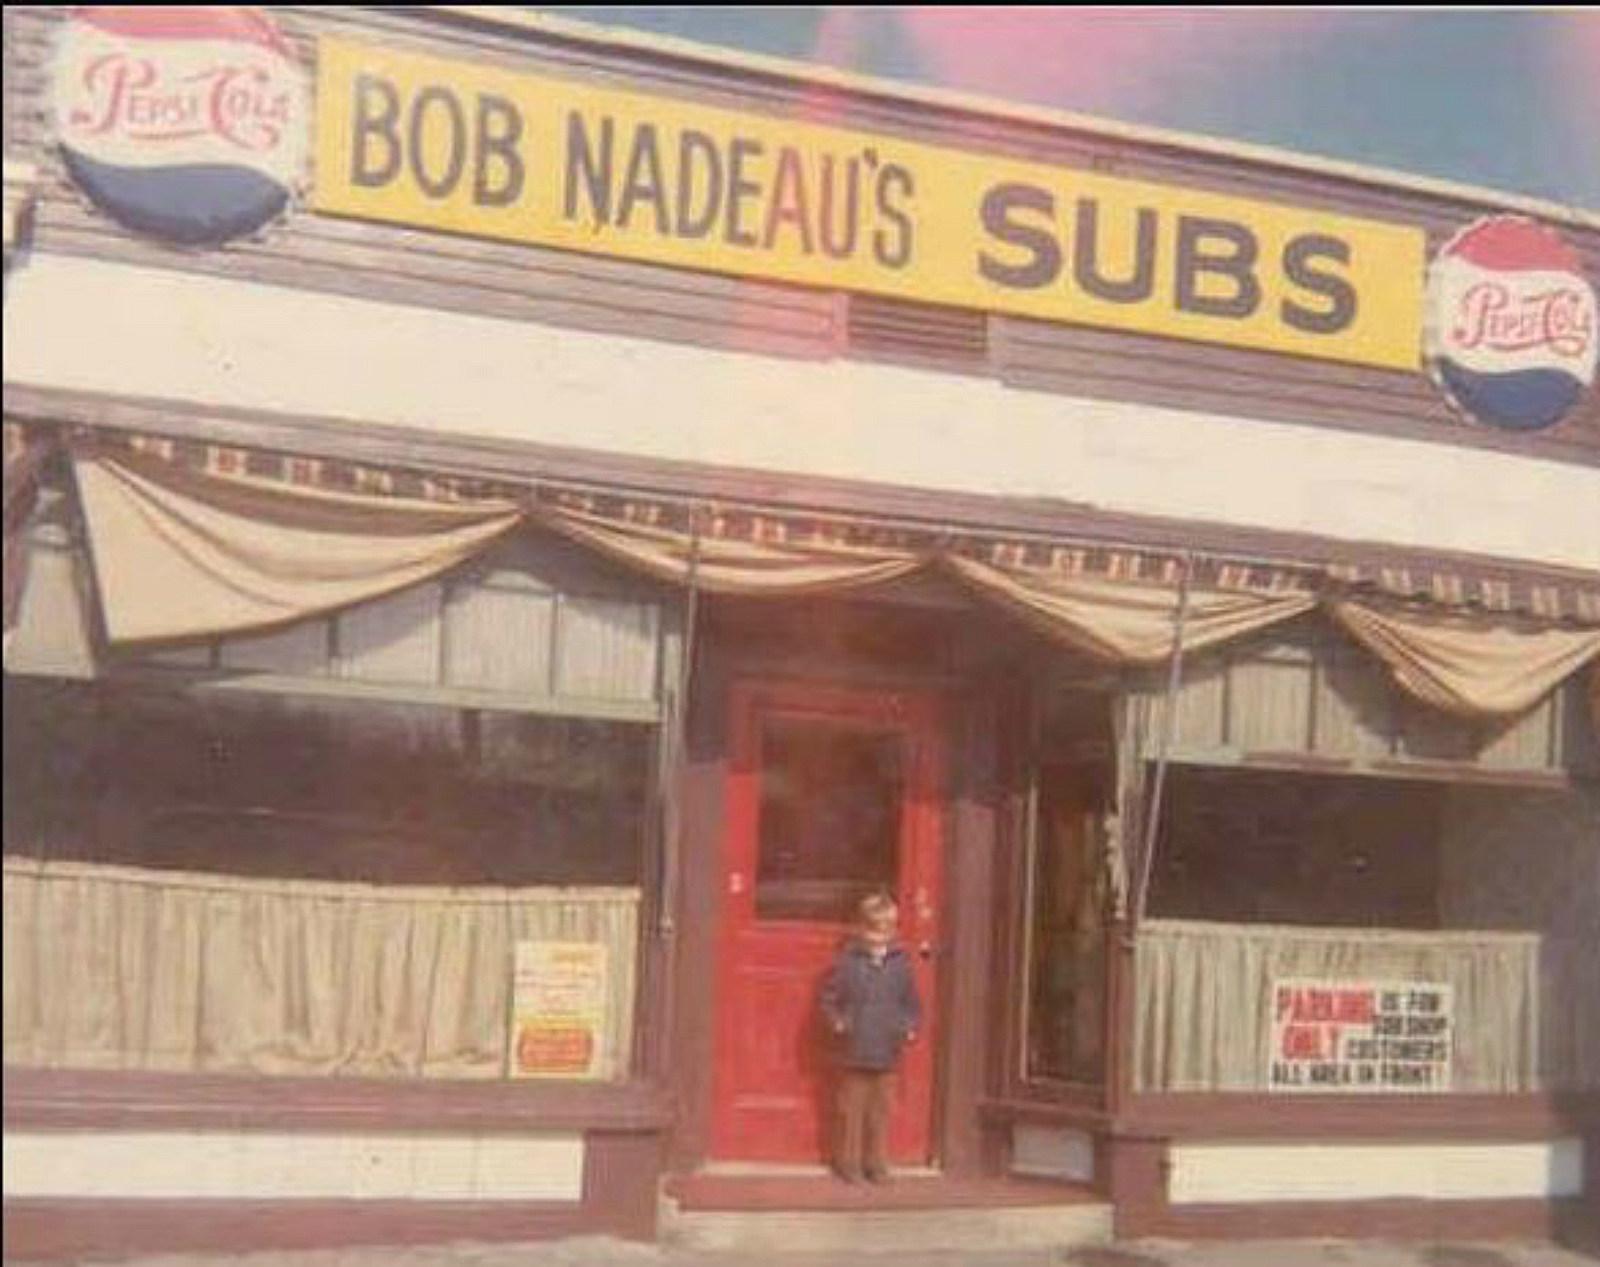 Nadeau's Subs Salads Wraps via Facebook